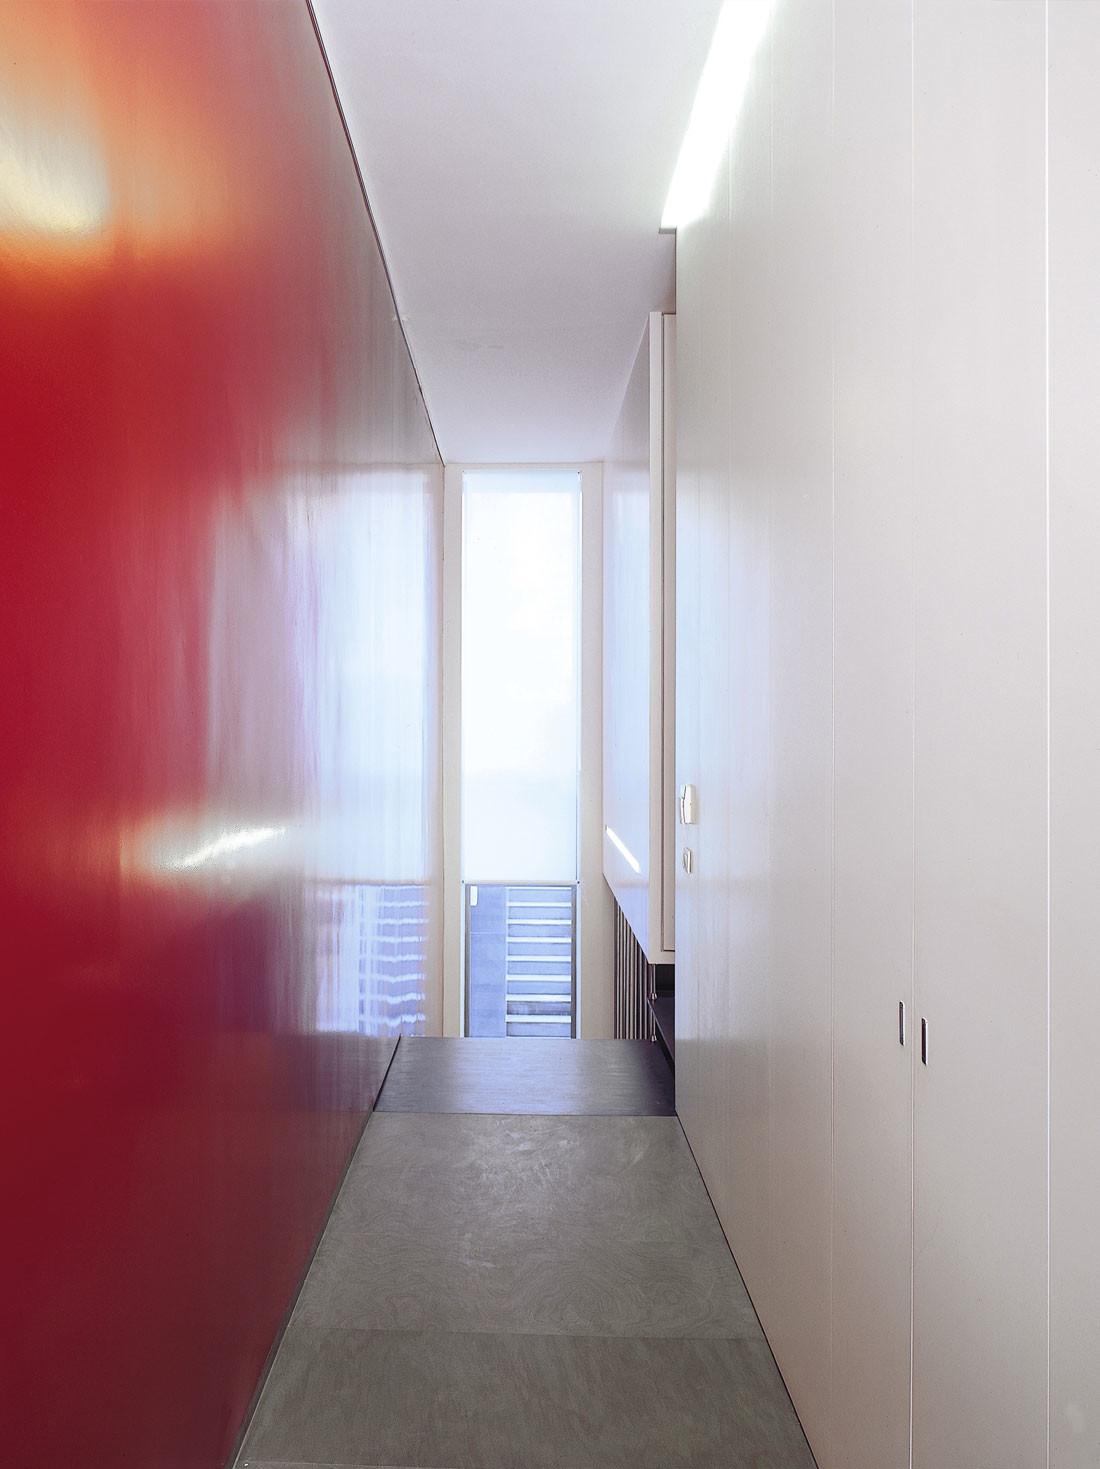 Via Nullo 53 Milan - mpa - marco pestalozza architetti